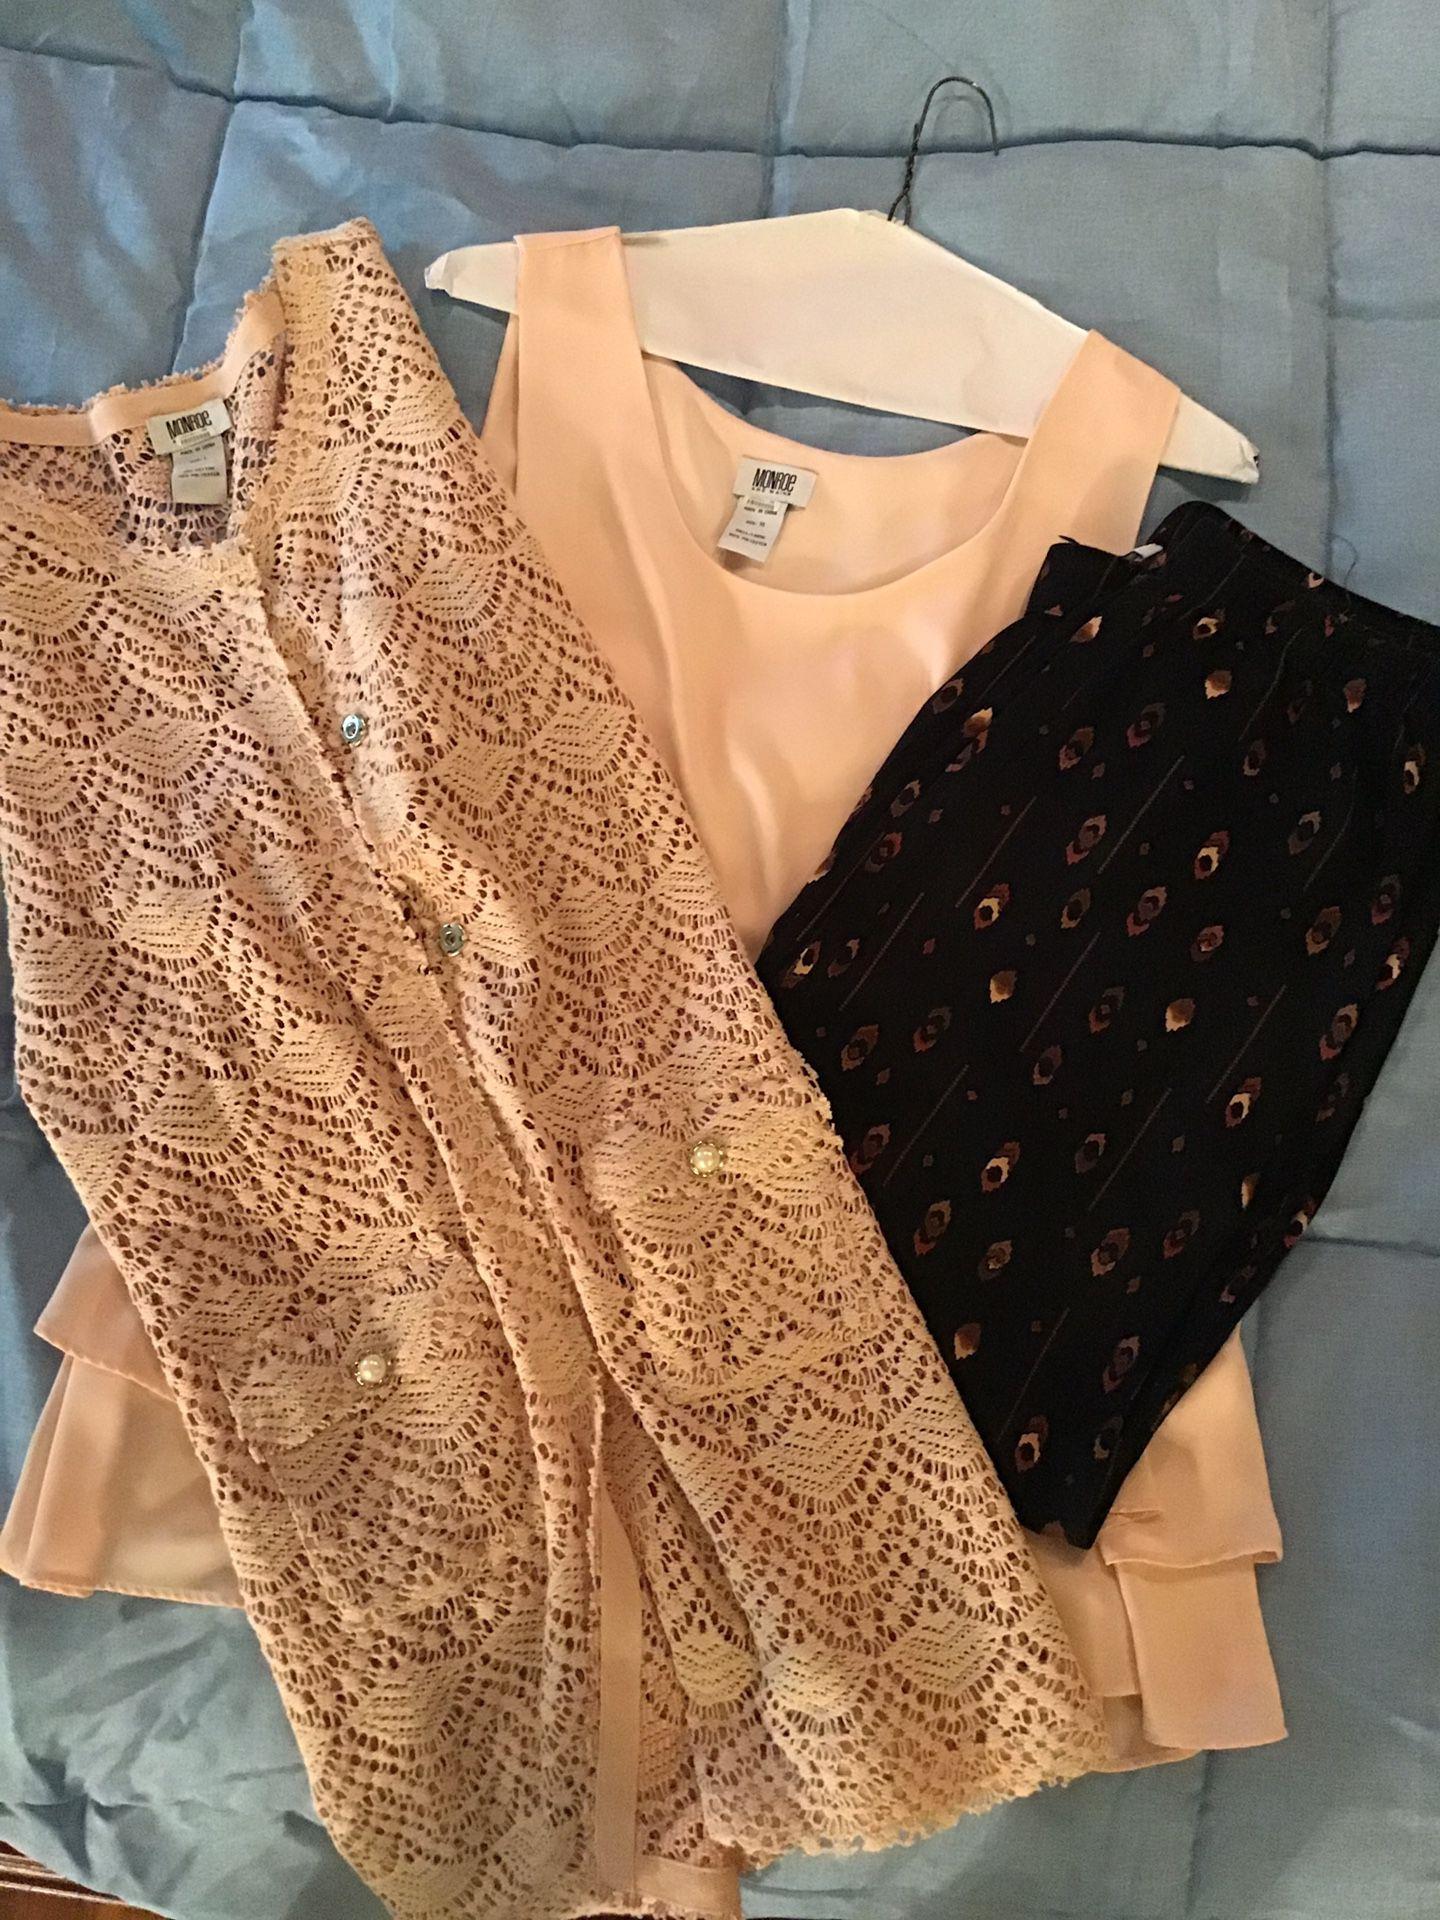 Size Large-XL Monroe & Main outfit set